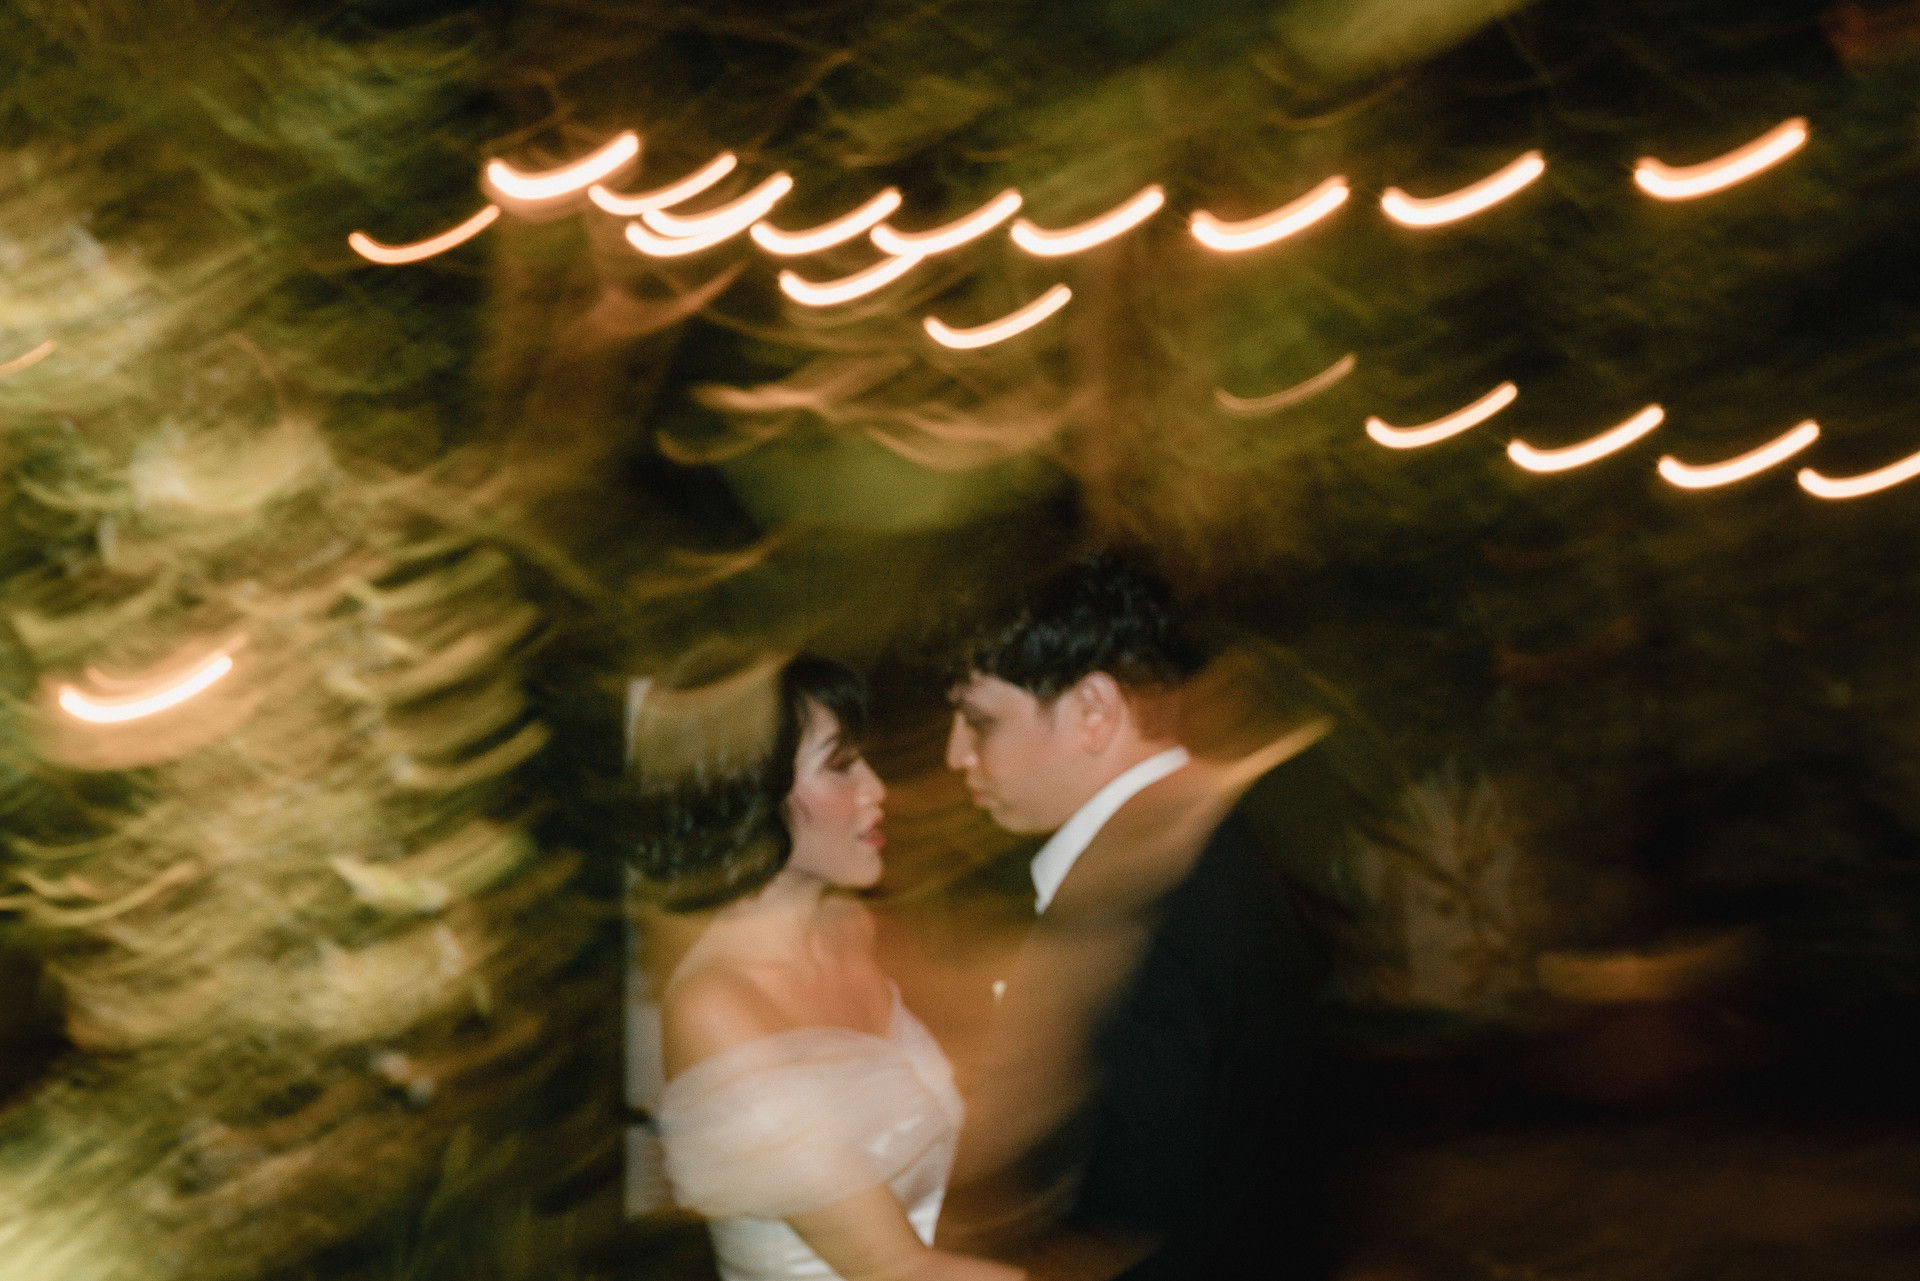 ALIF-WEDHA-WEDDING-38.jpg